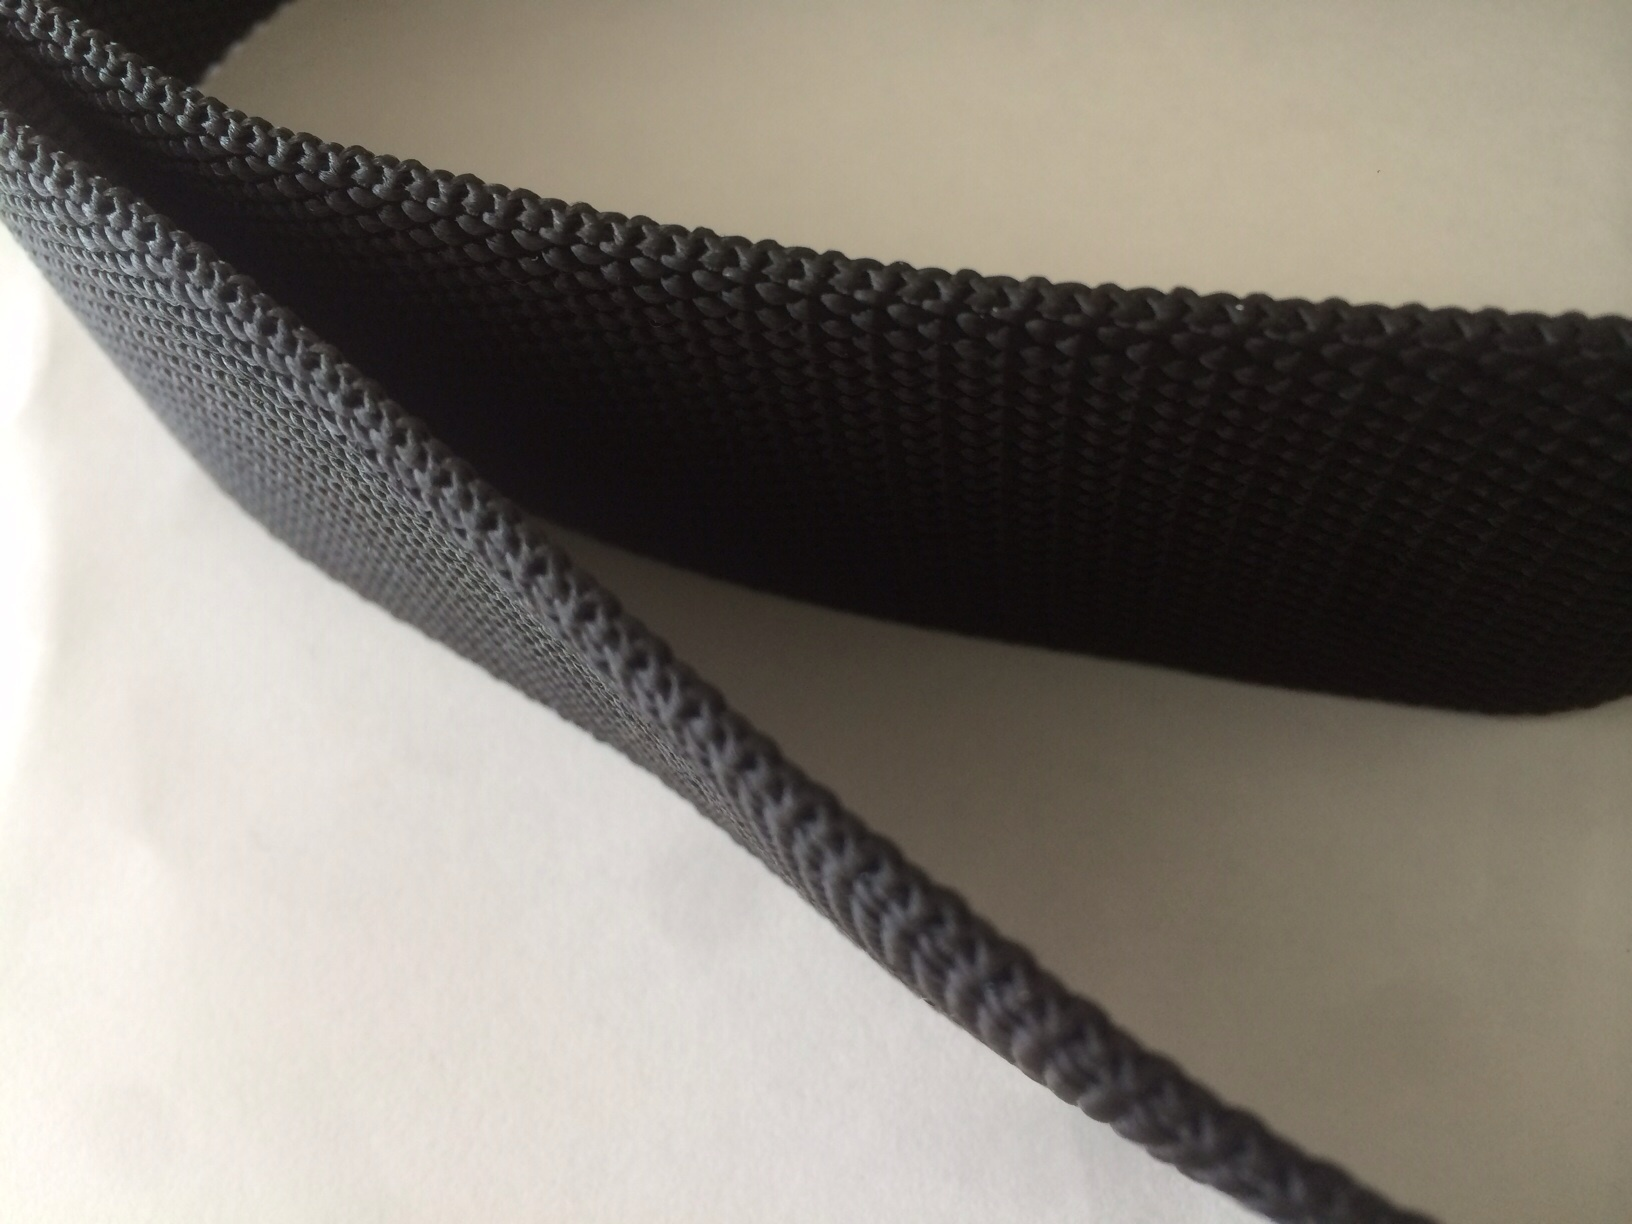 PP 厚手 2.5mm厚 50㎜幅 黒 1m